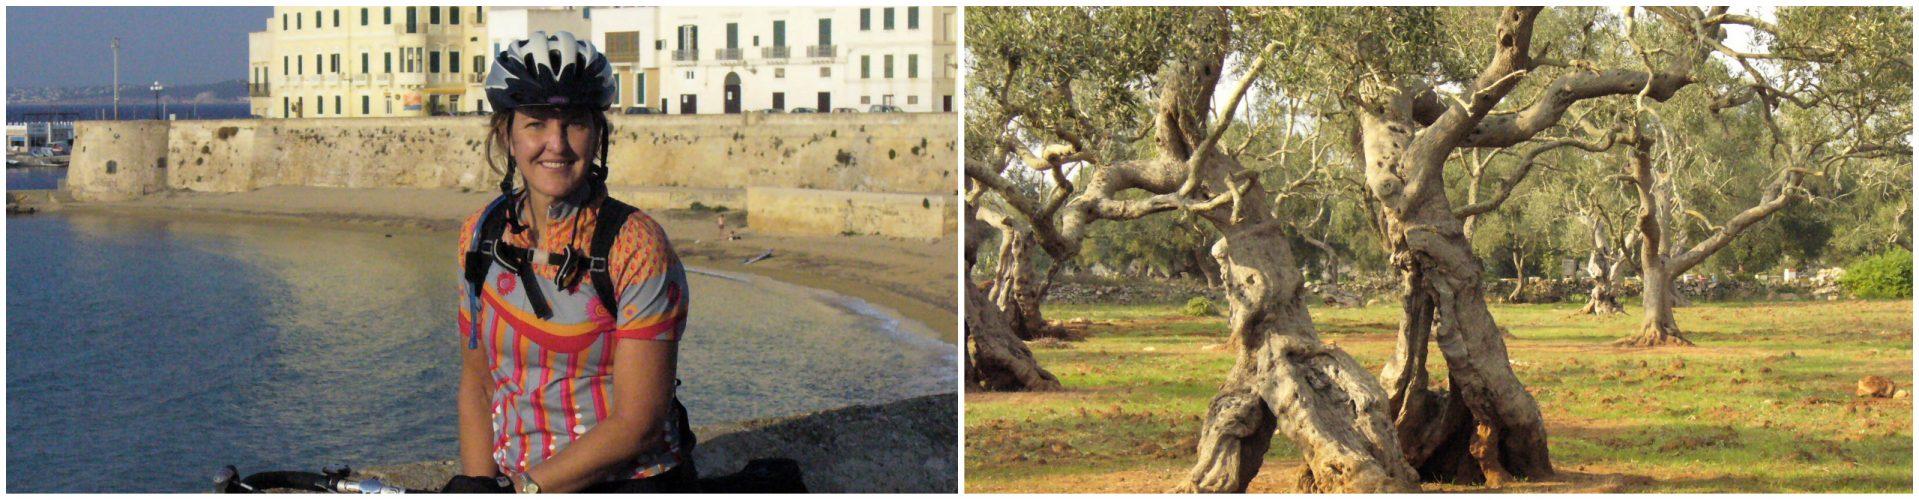 Cycling Puglia - Olive Trees and the Coast